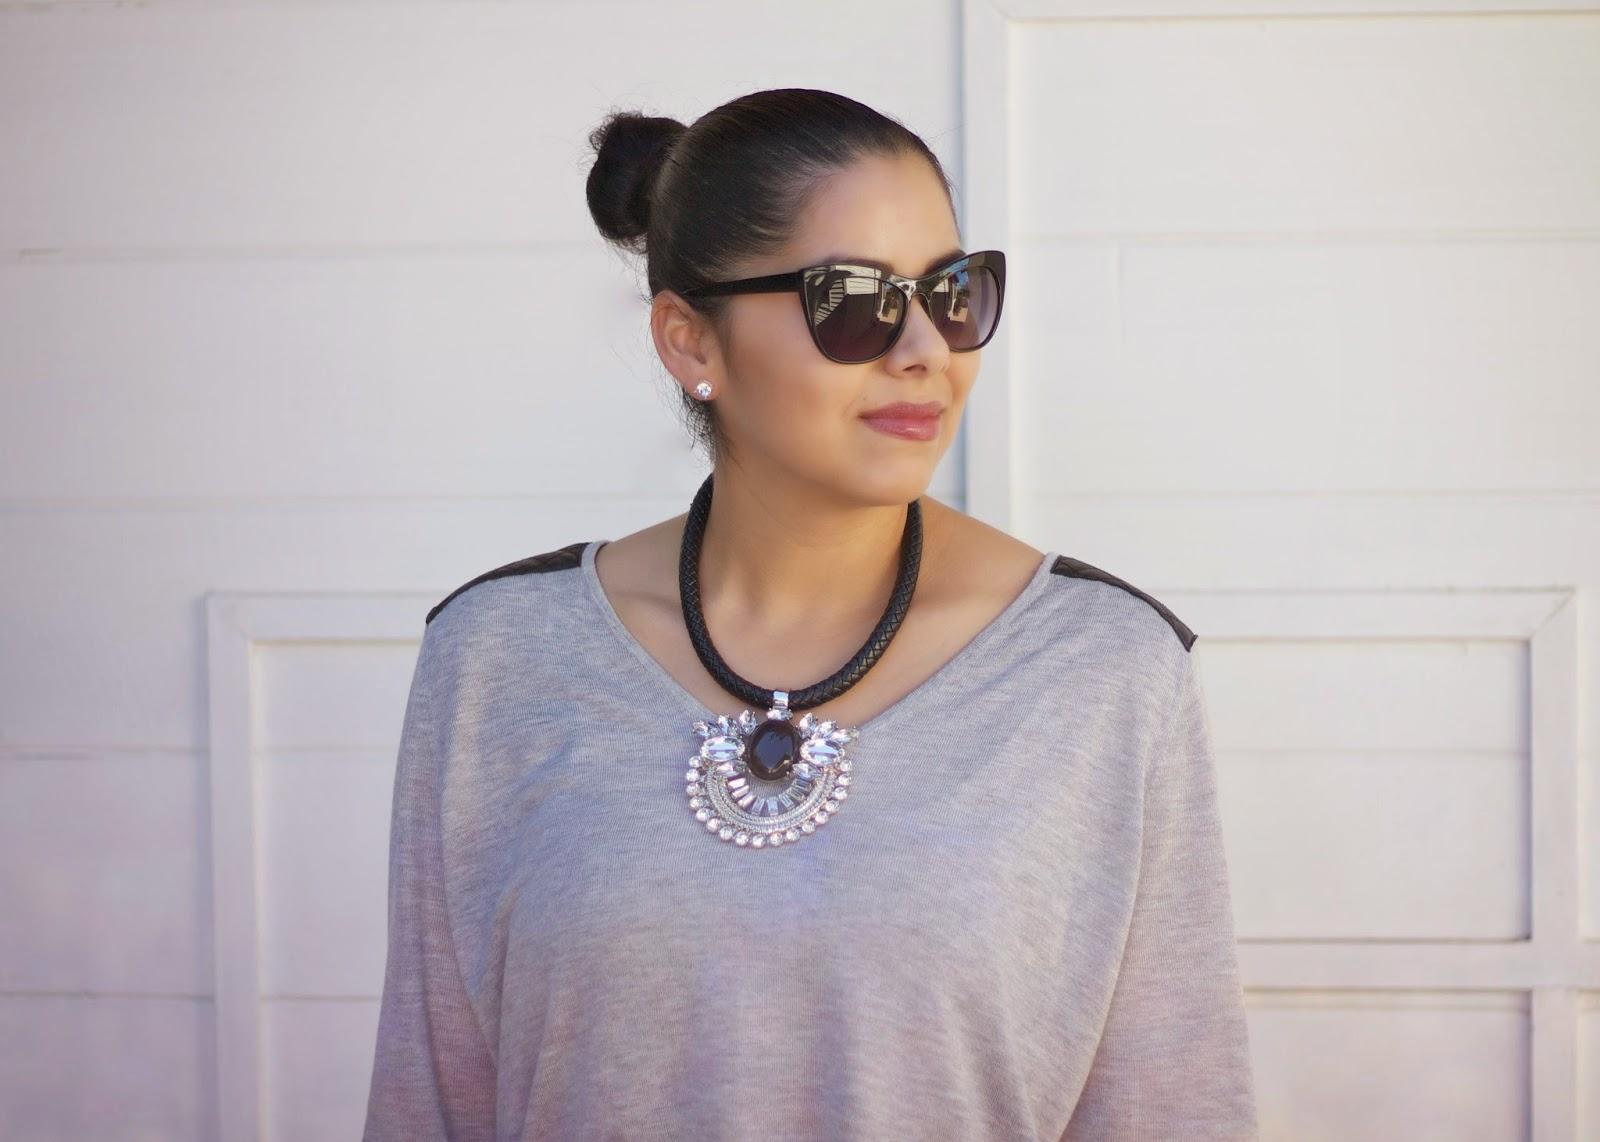 cateye sunnies, perfect cat eye sunglasses, cat eye sunglasses, statement necklace with pendant